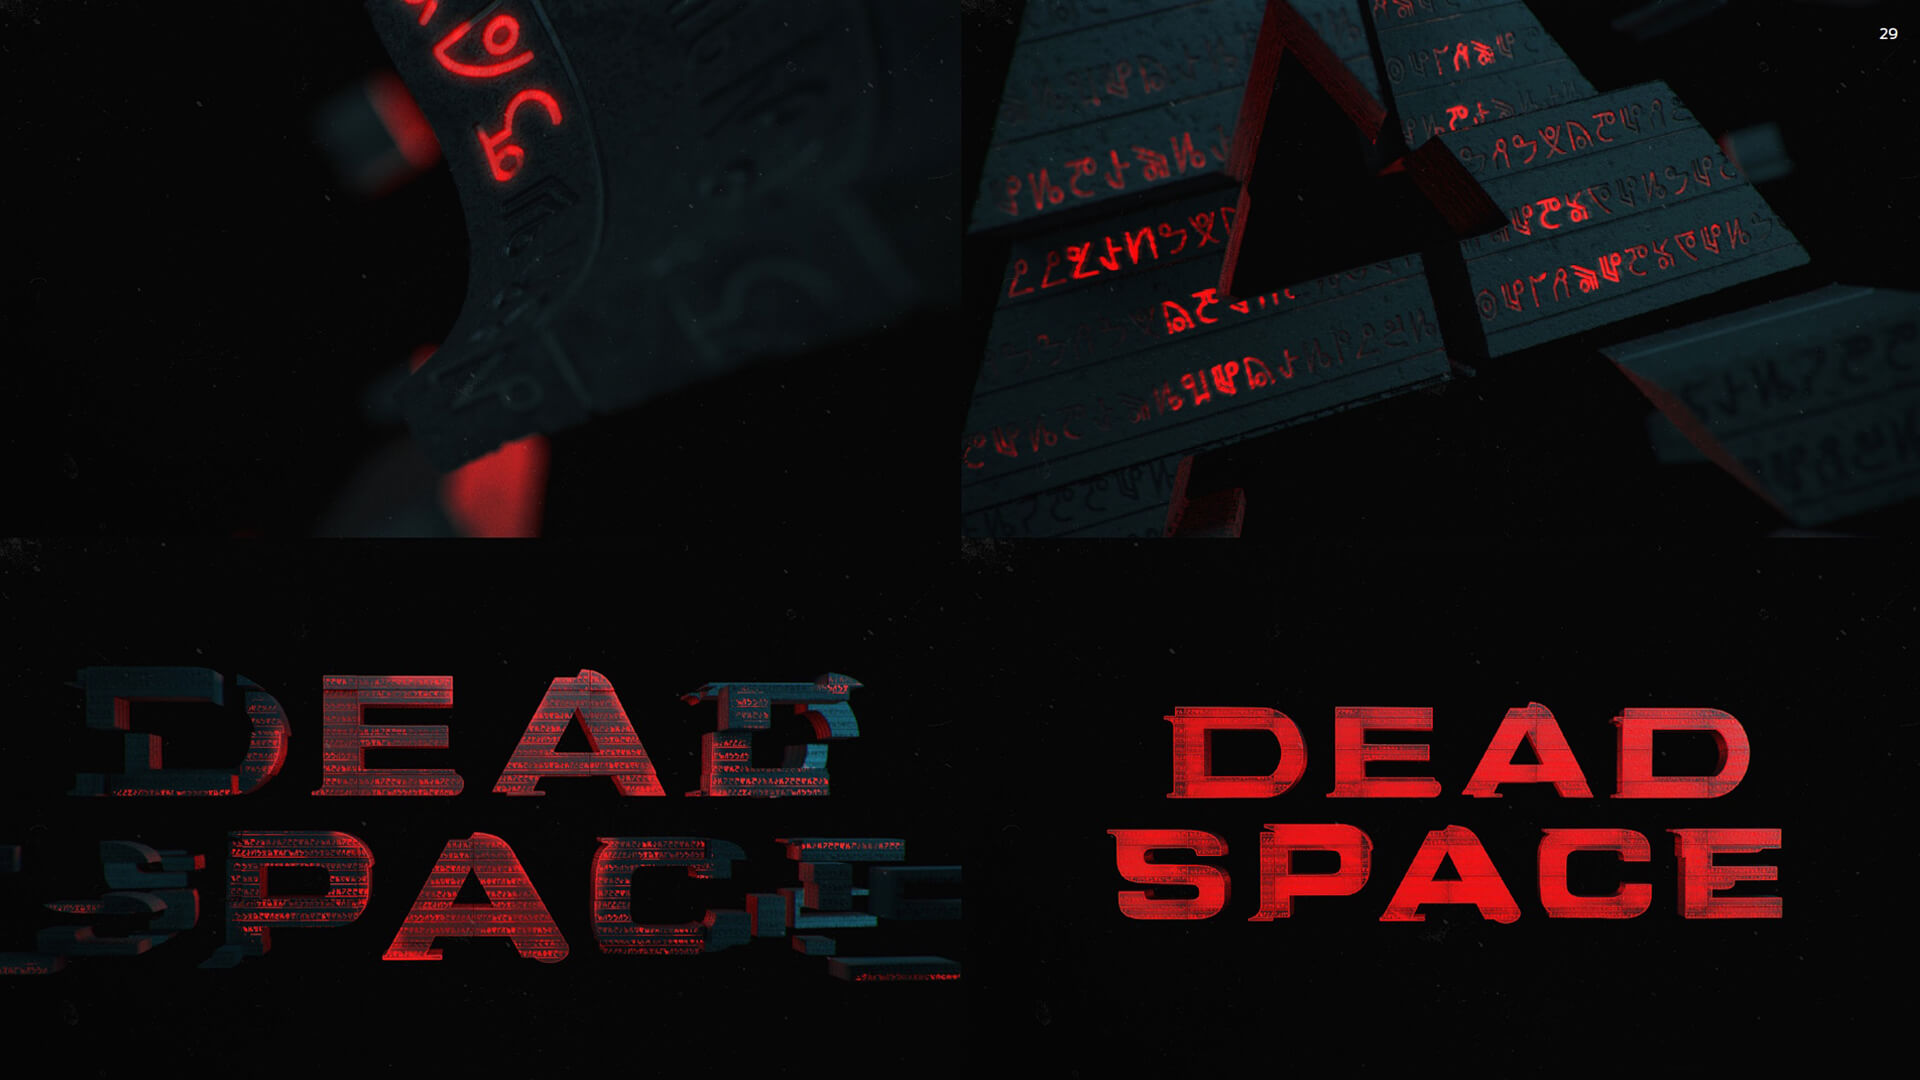 deadspaceframes_01